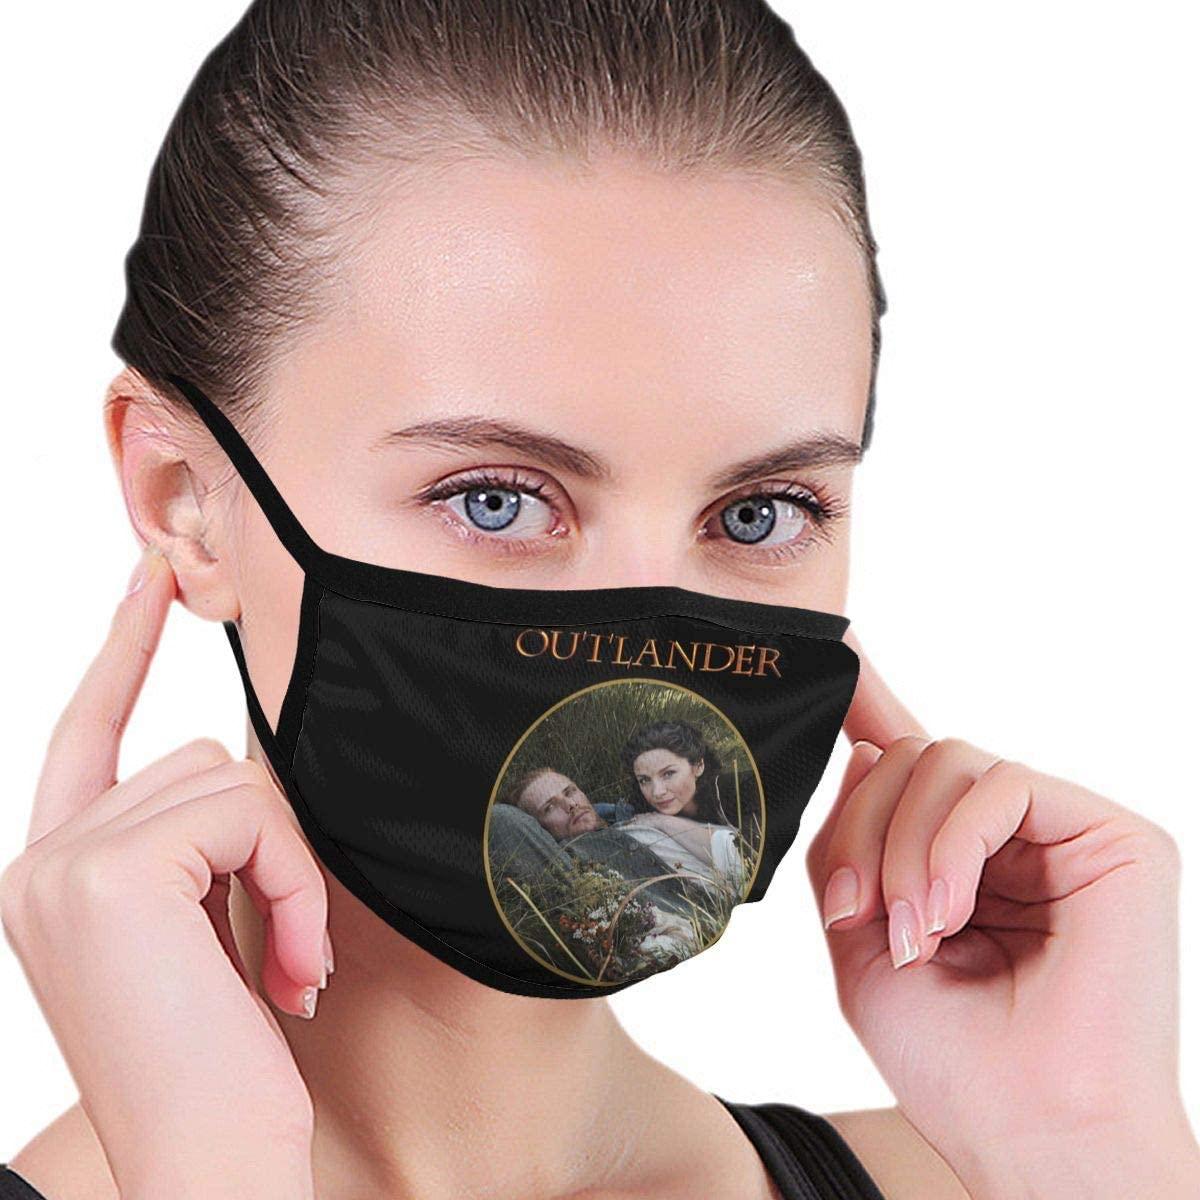 Qwtykeertyi Outlander Fashion Protective Reusable Unisex Black Cotton Washable Balaclava